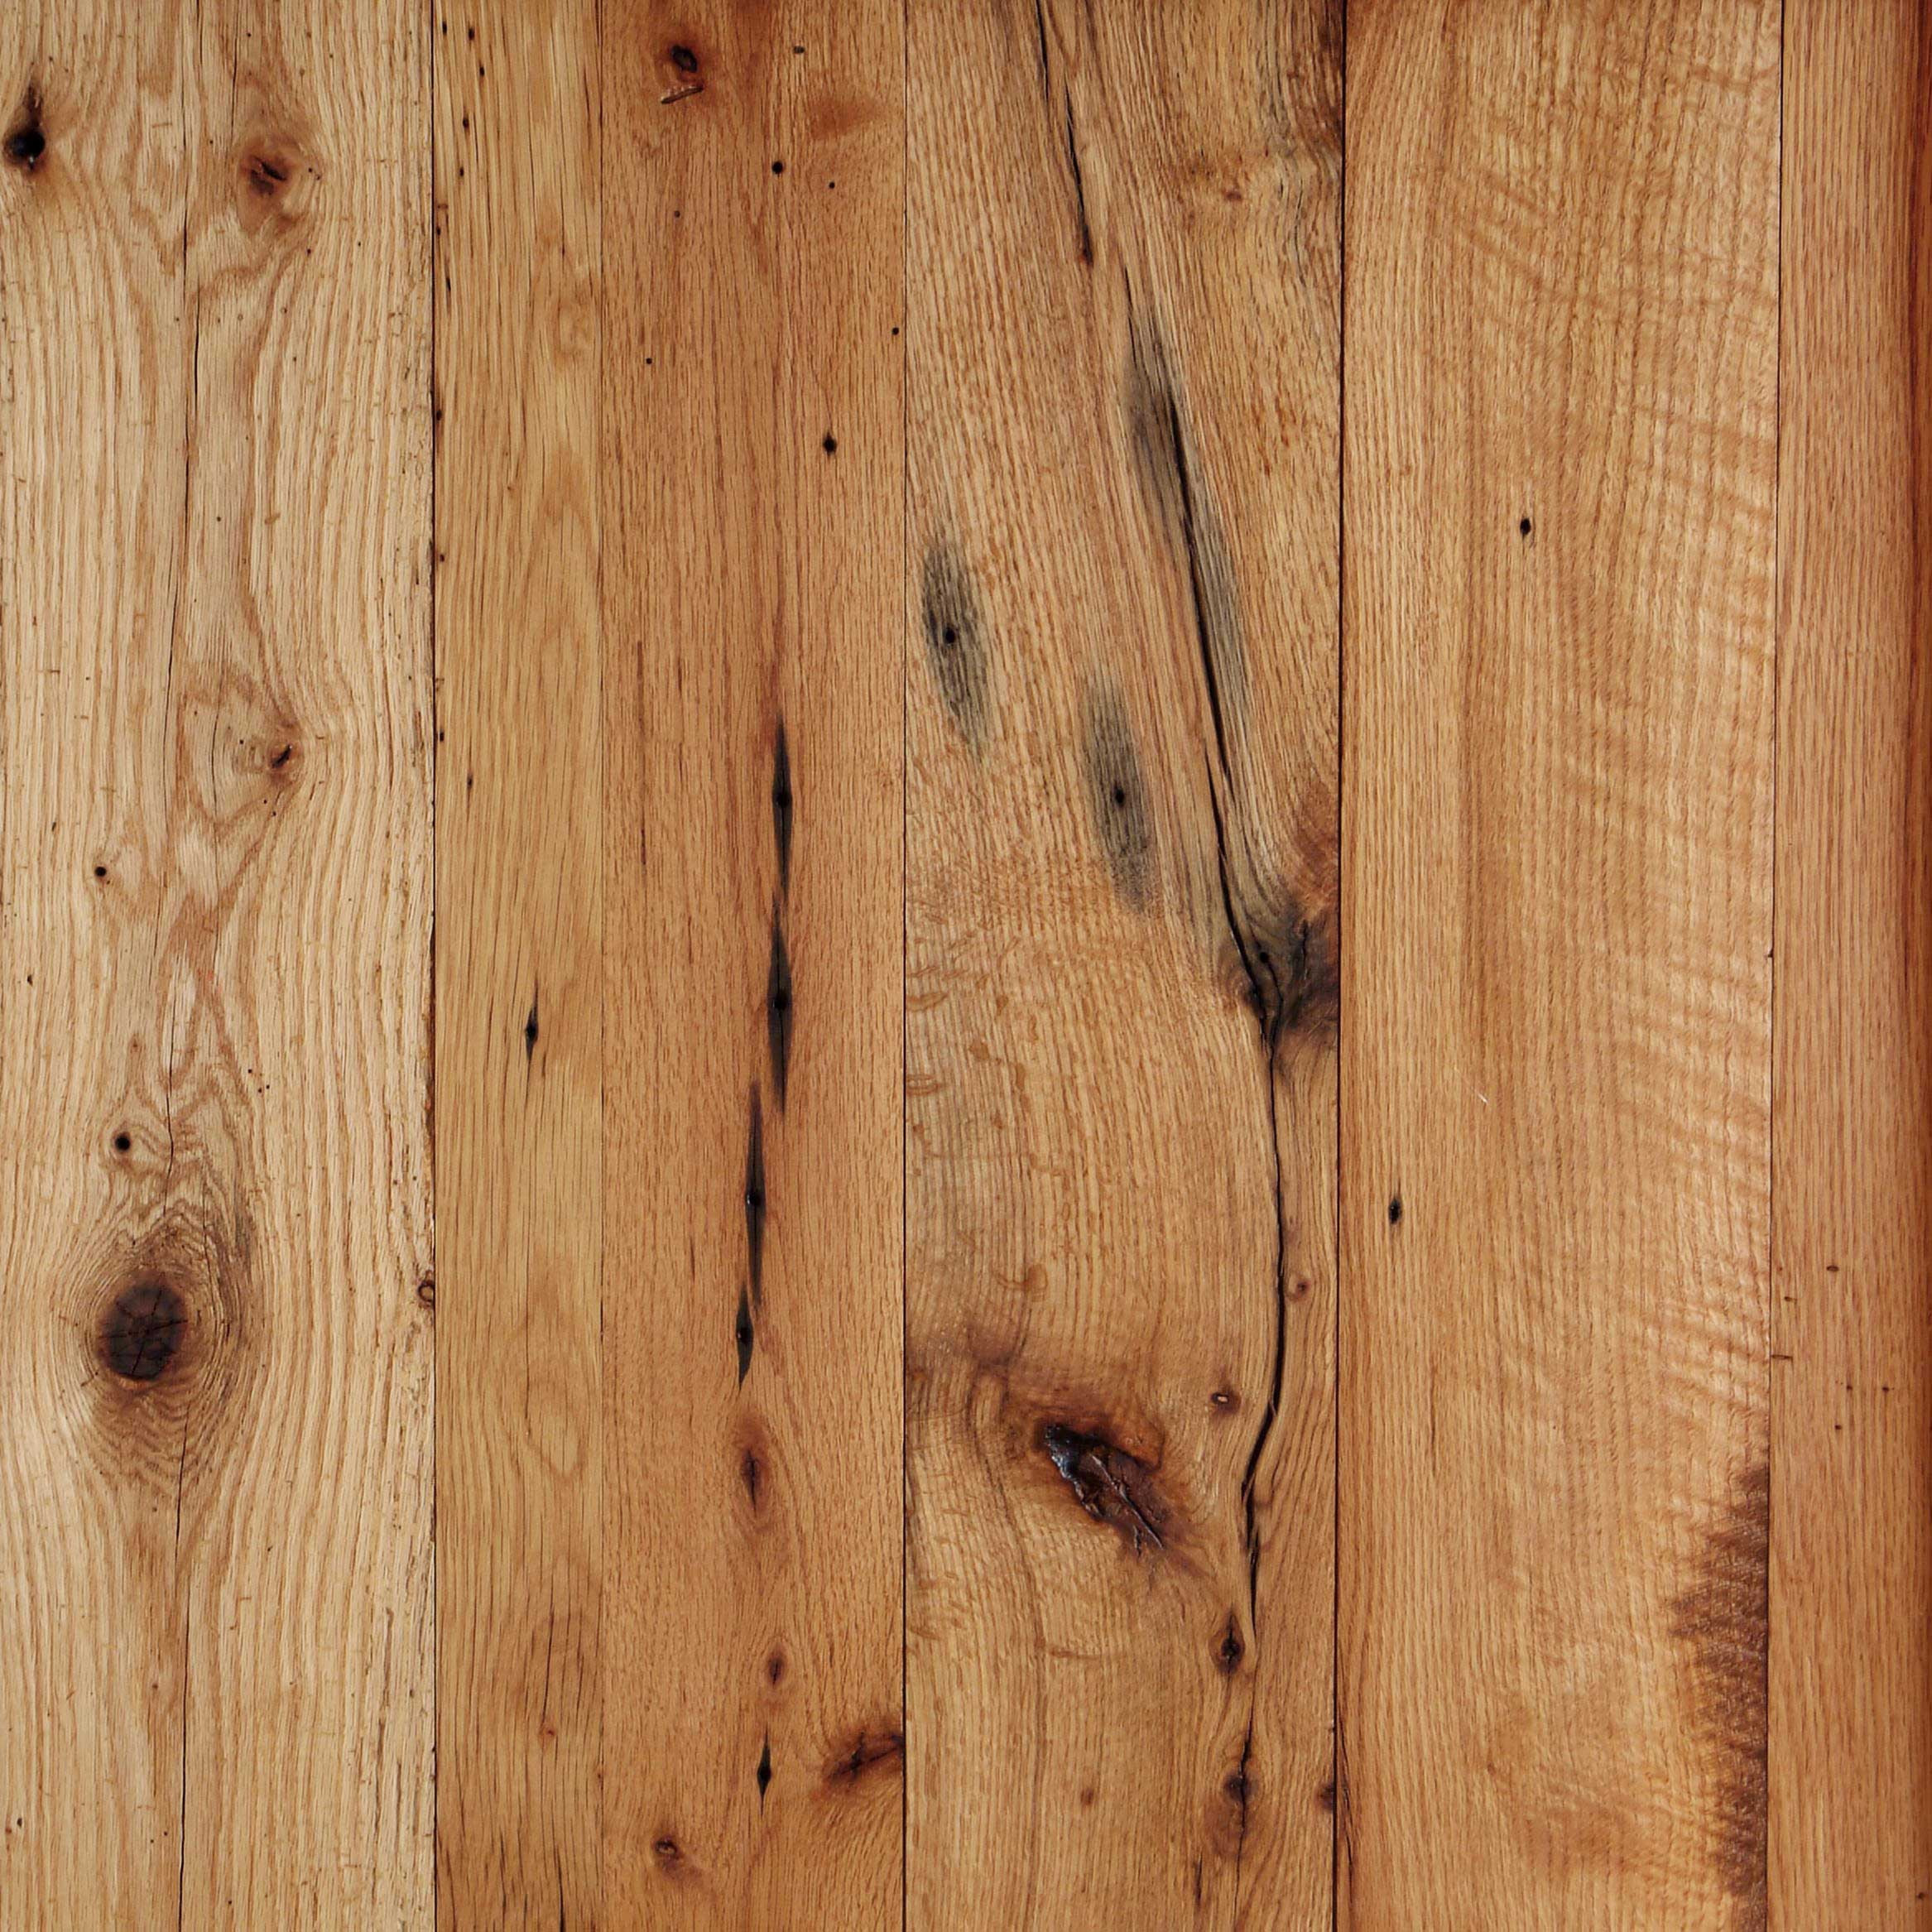 1 1 2 wide oak hardwood flooring of longleaf lumber reclaimed red white oak wood in reclaimed salvaged antique red oak flooring wide boards knots